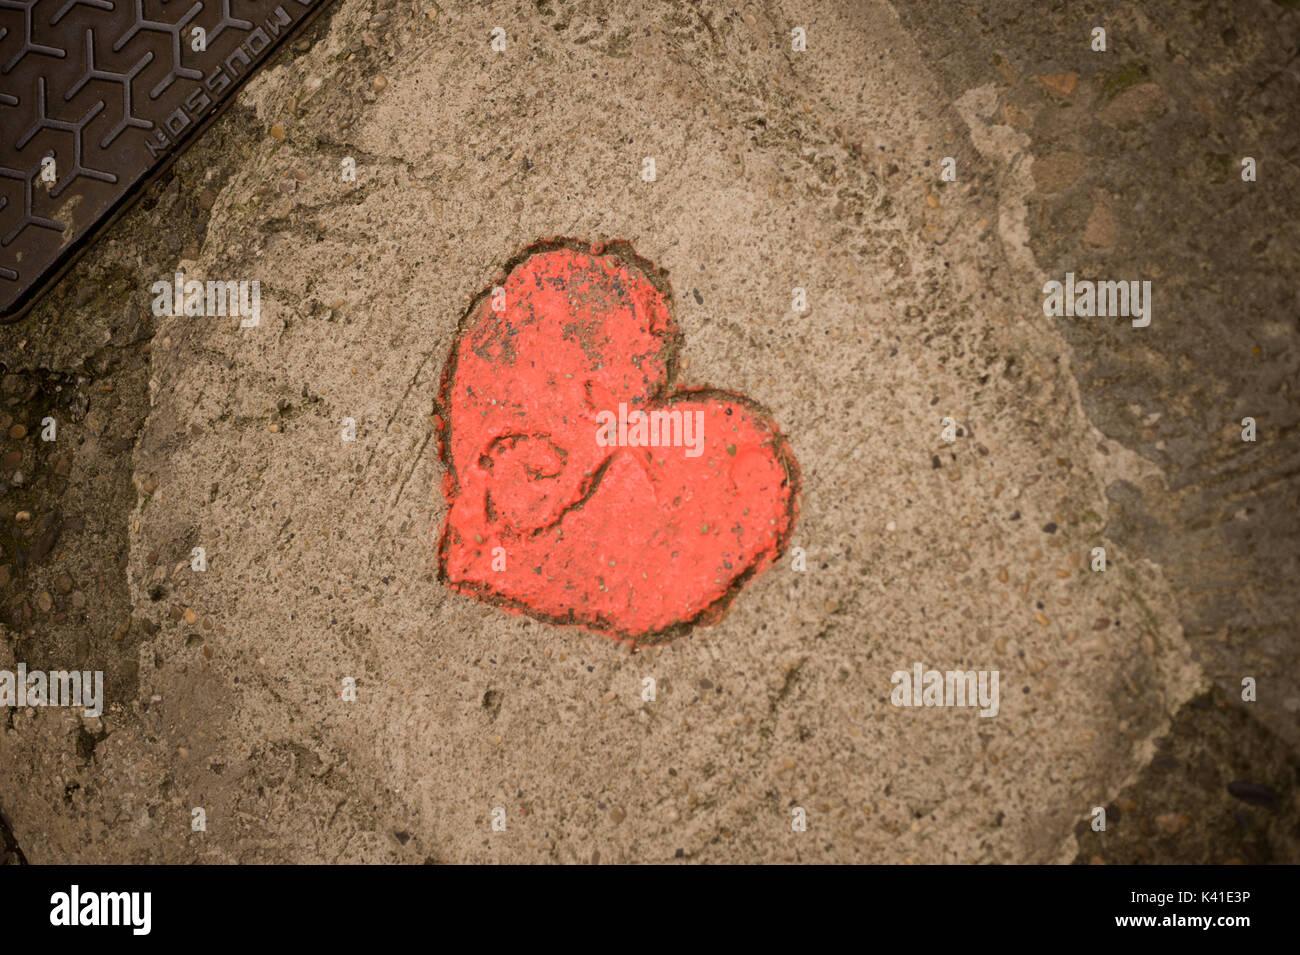 Letter J in red heart on ground, Sarlat, Dordogne, France Stock Photo